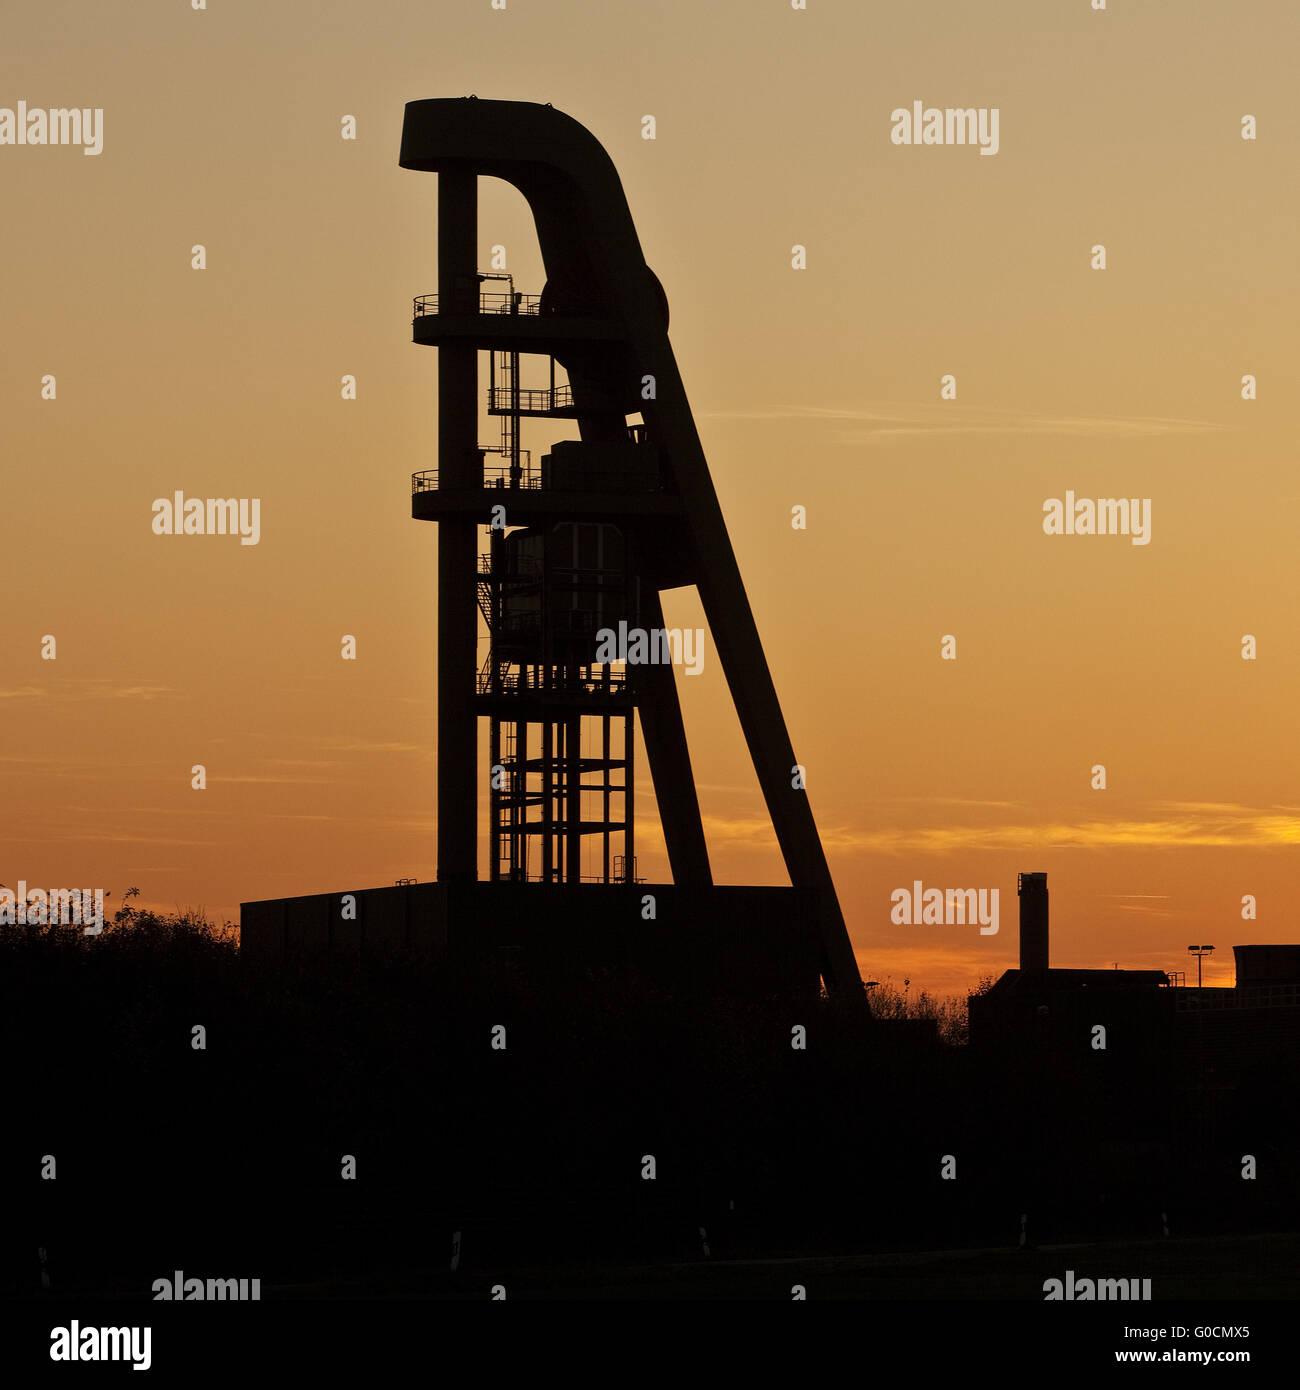 pit frame of Lerche shaft at sunset, Hamm, Germany - Stock Image